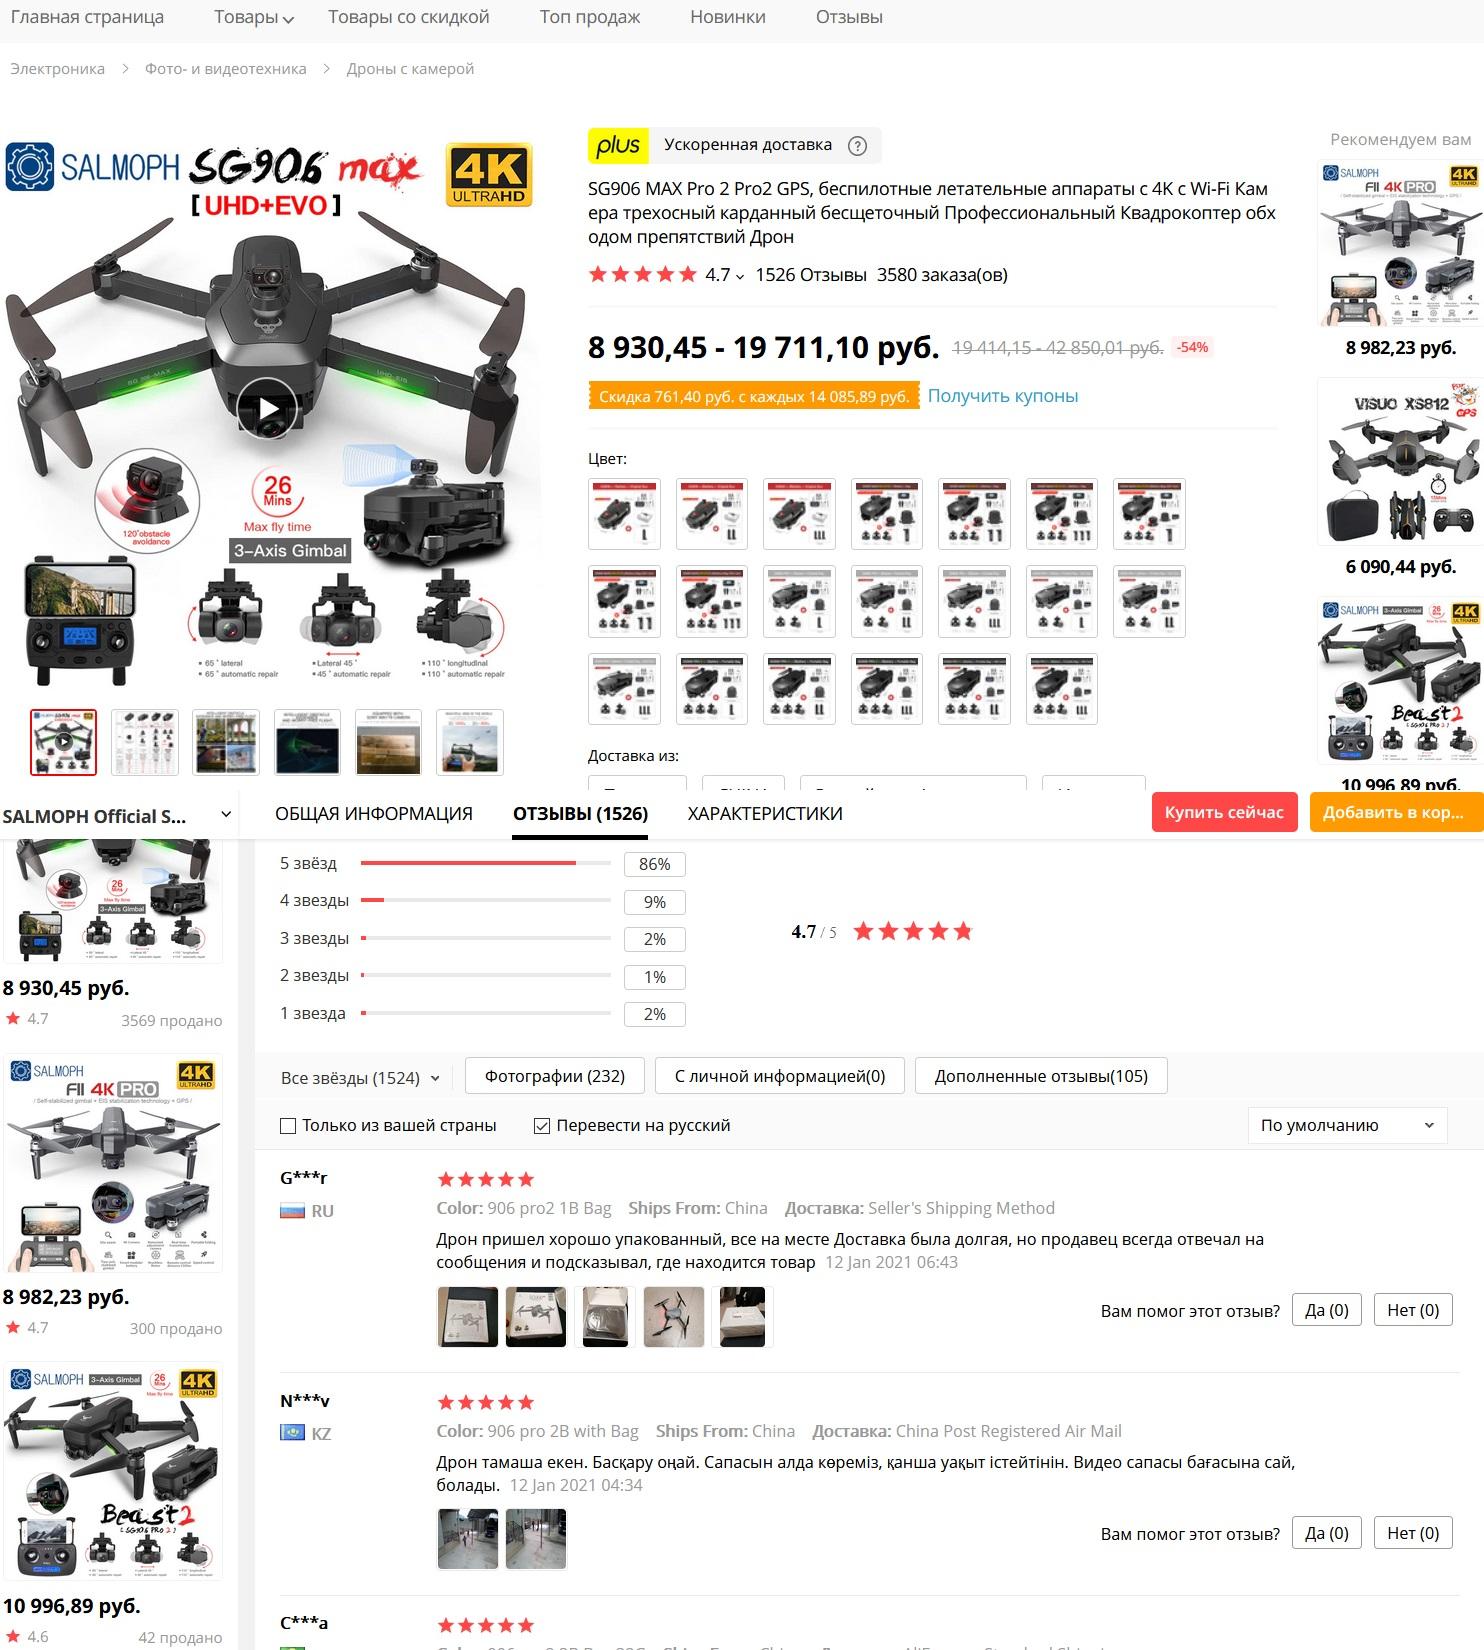 Квадрокоптер SG906 MAX Pro 2 GPS